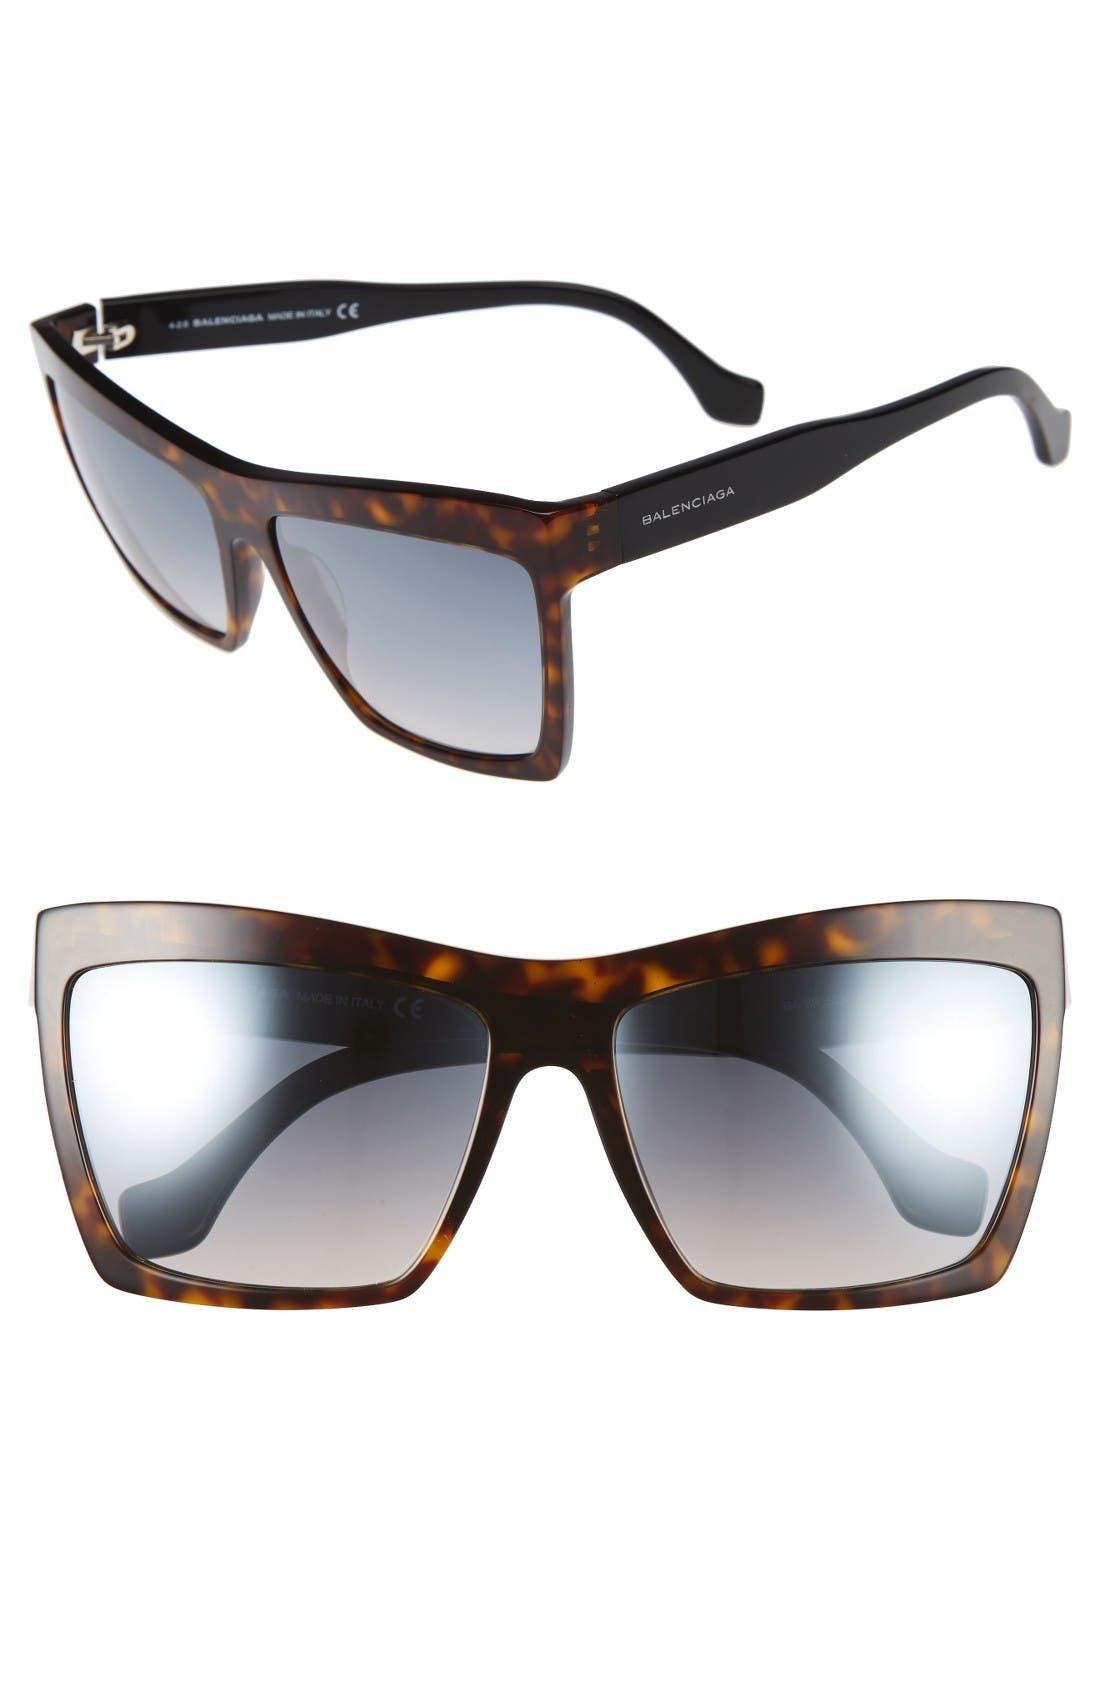 60mm Oversize Sunglasses,                         Main,                         color, Havana/ Black/ Flash Azure